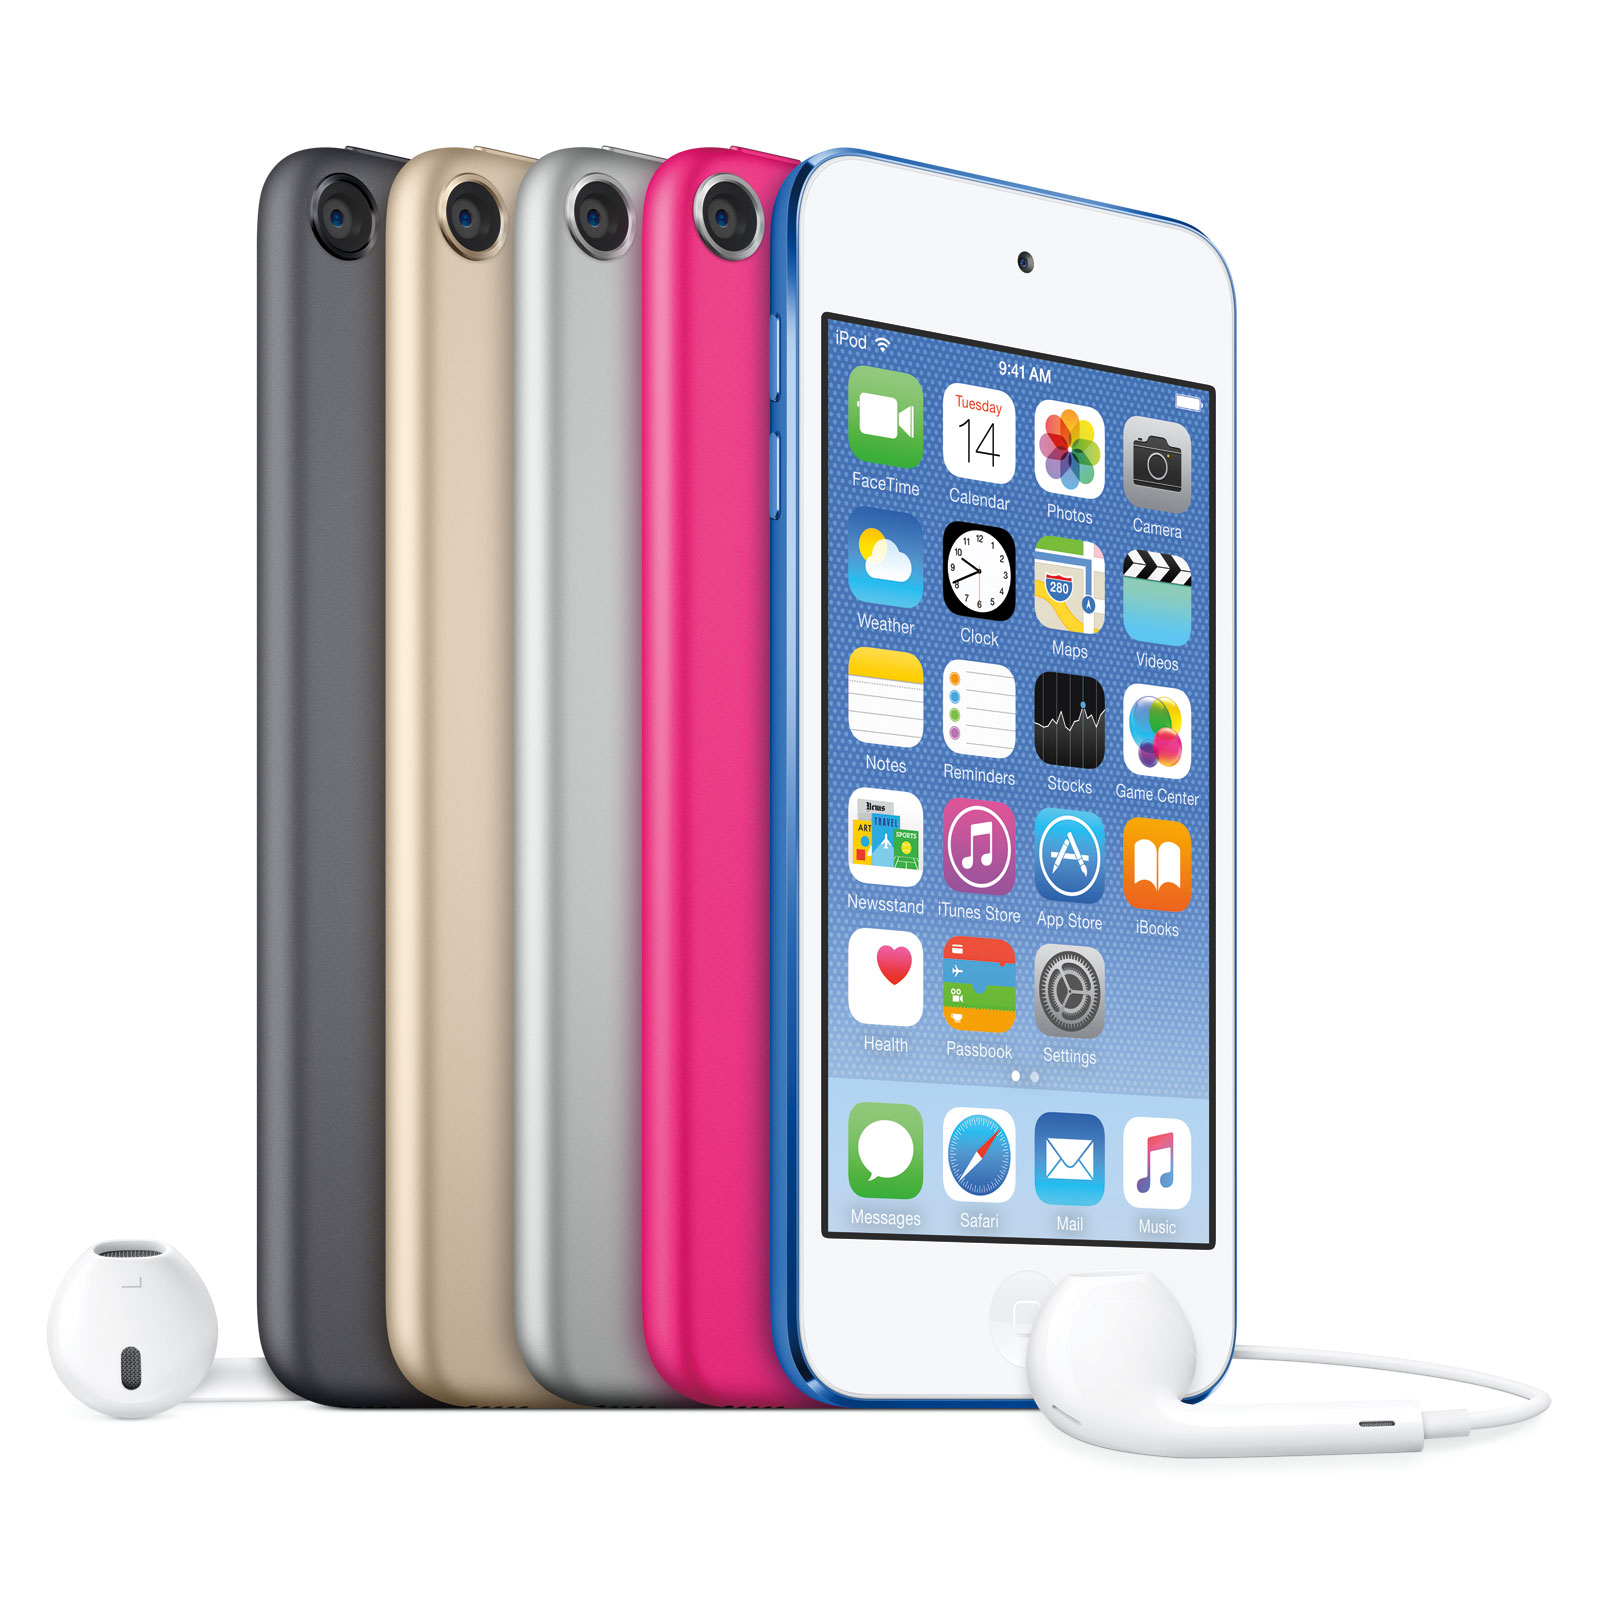 apple ipod touch 16 go argent 2015 lecteur mp3 ipod. Black Bedroom Furniture Sets. Home Design Ideas